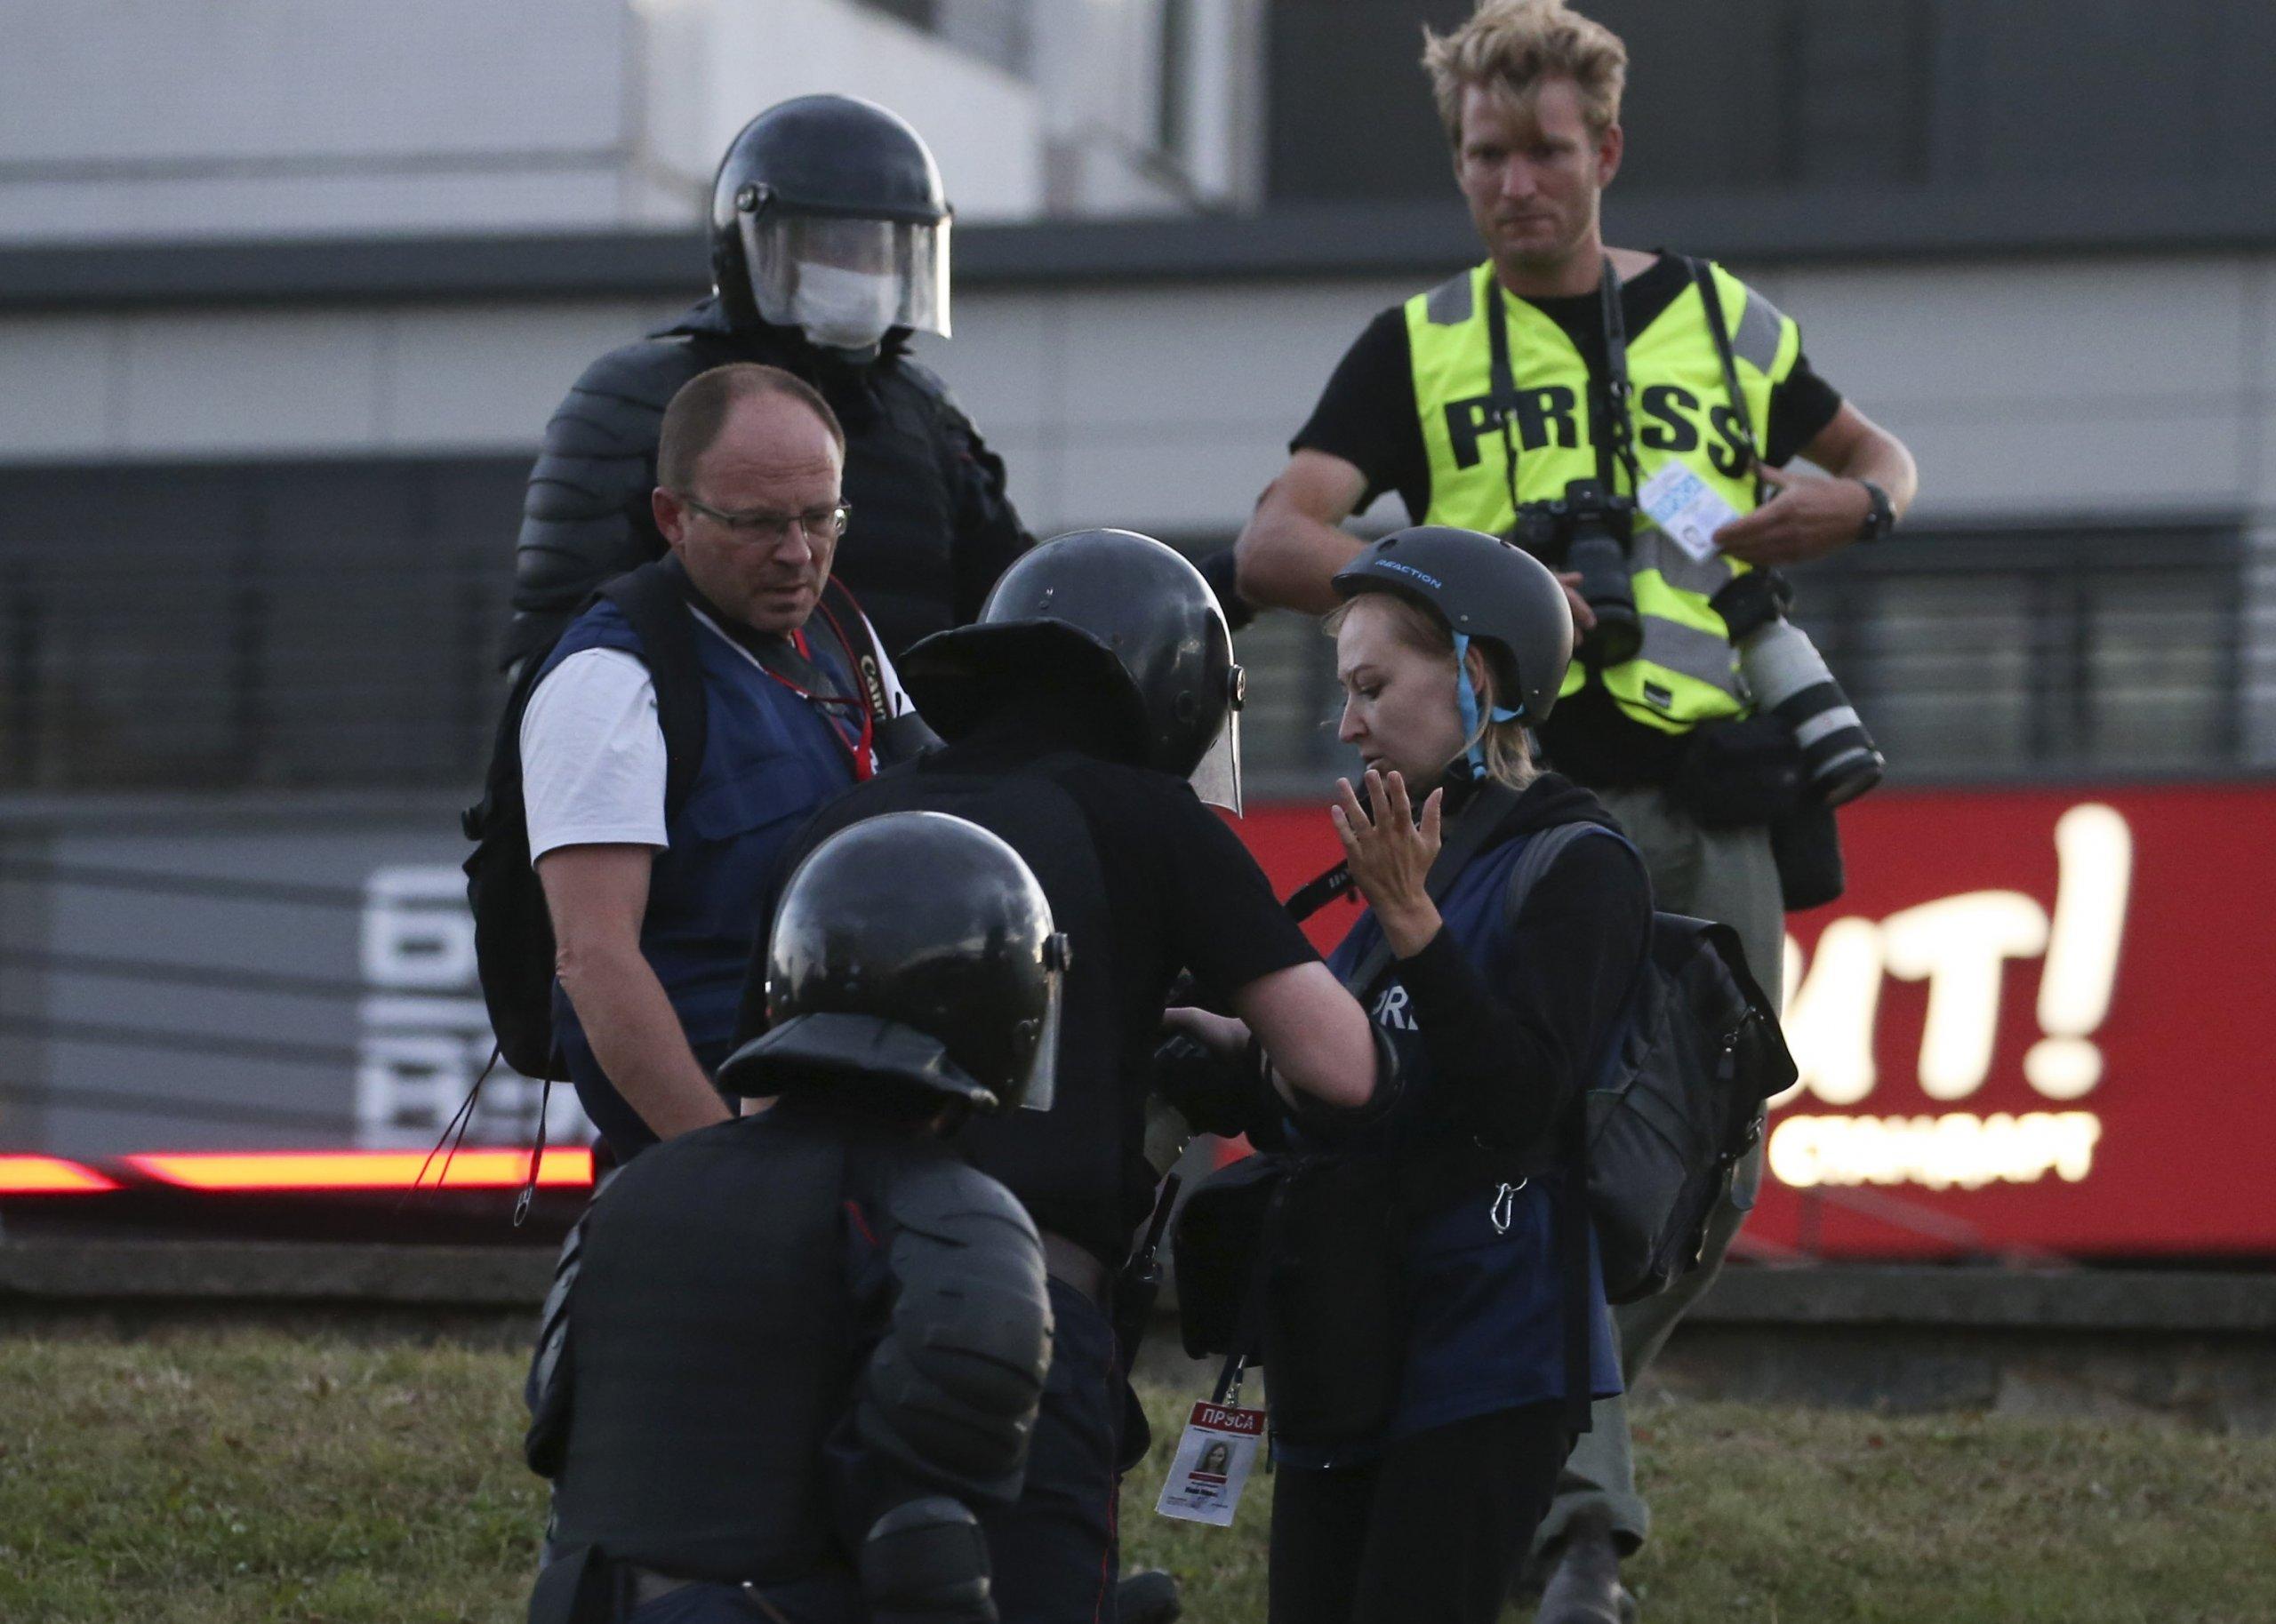 Solidarity with Belarus media